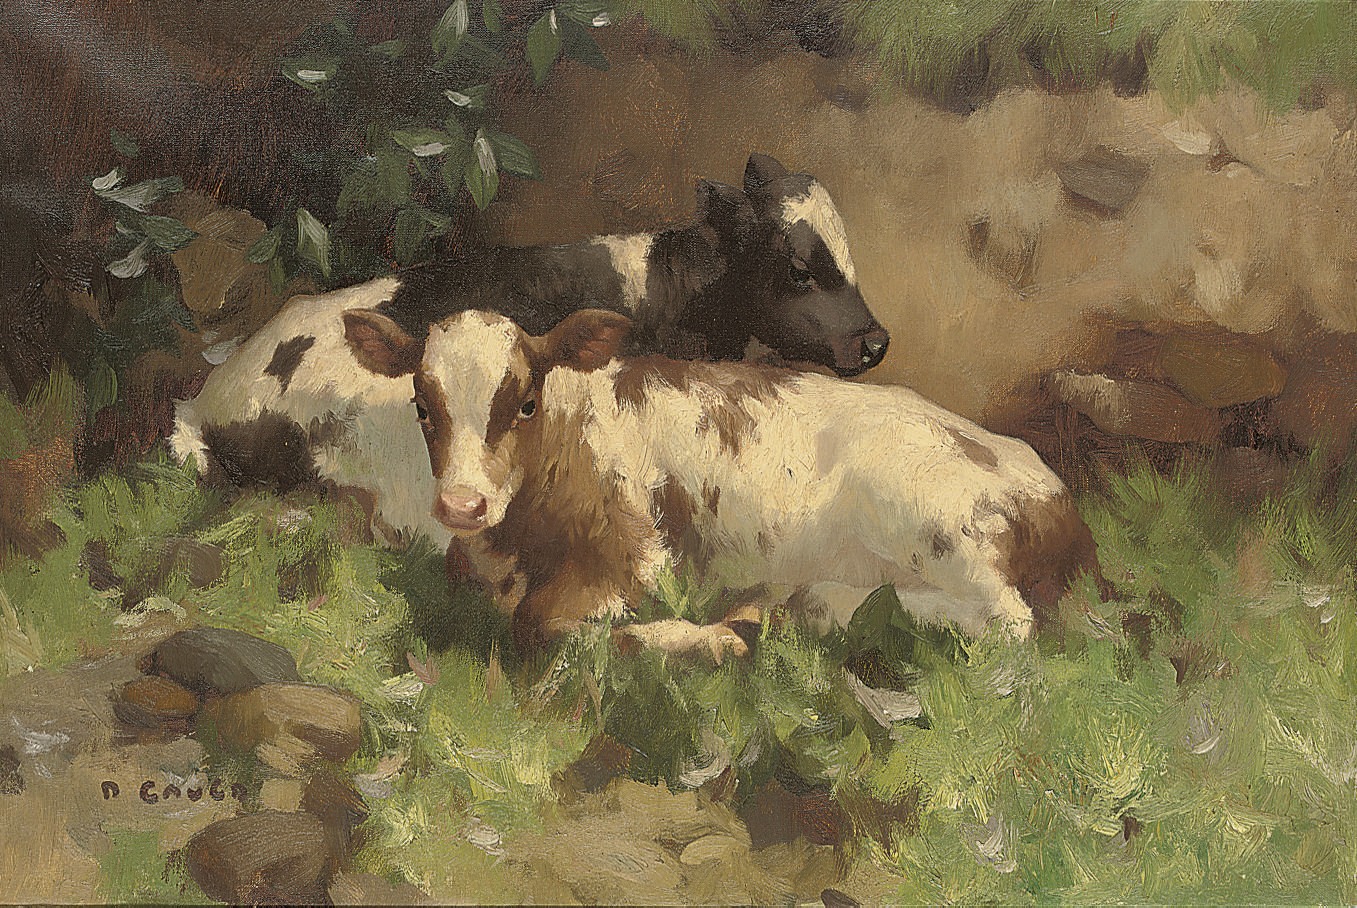 David Gauld, R.S.A. (1865-1936